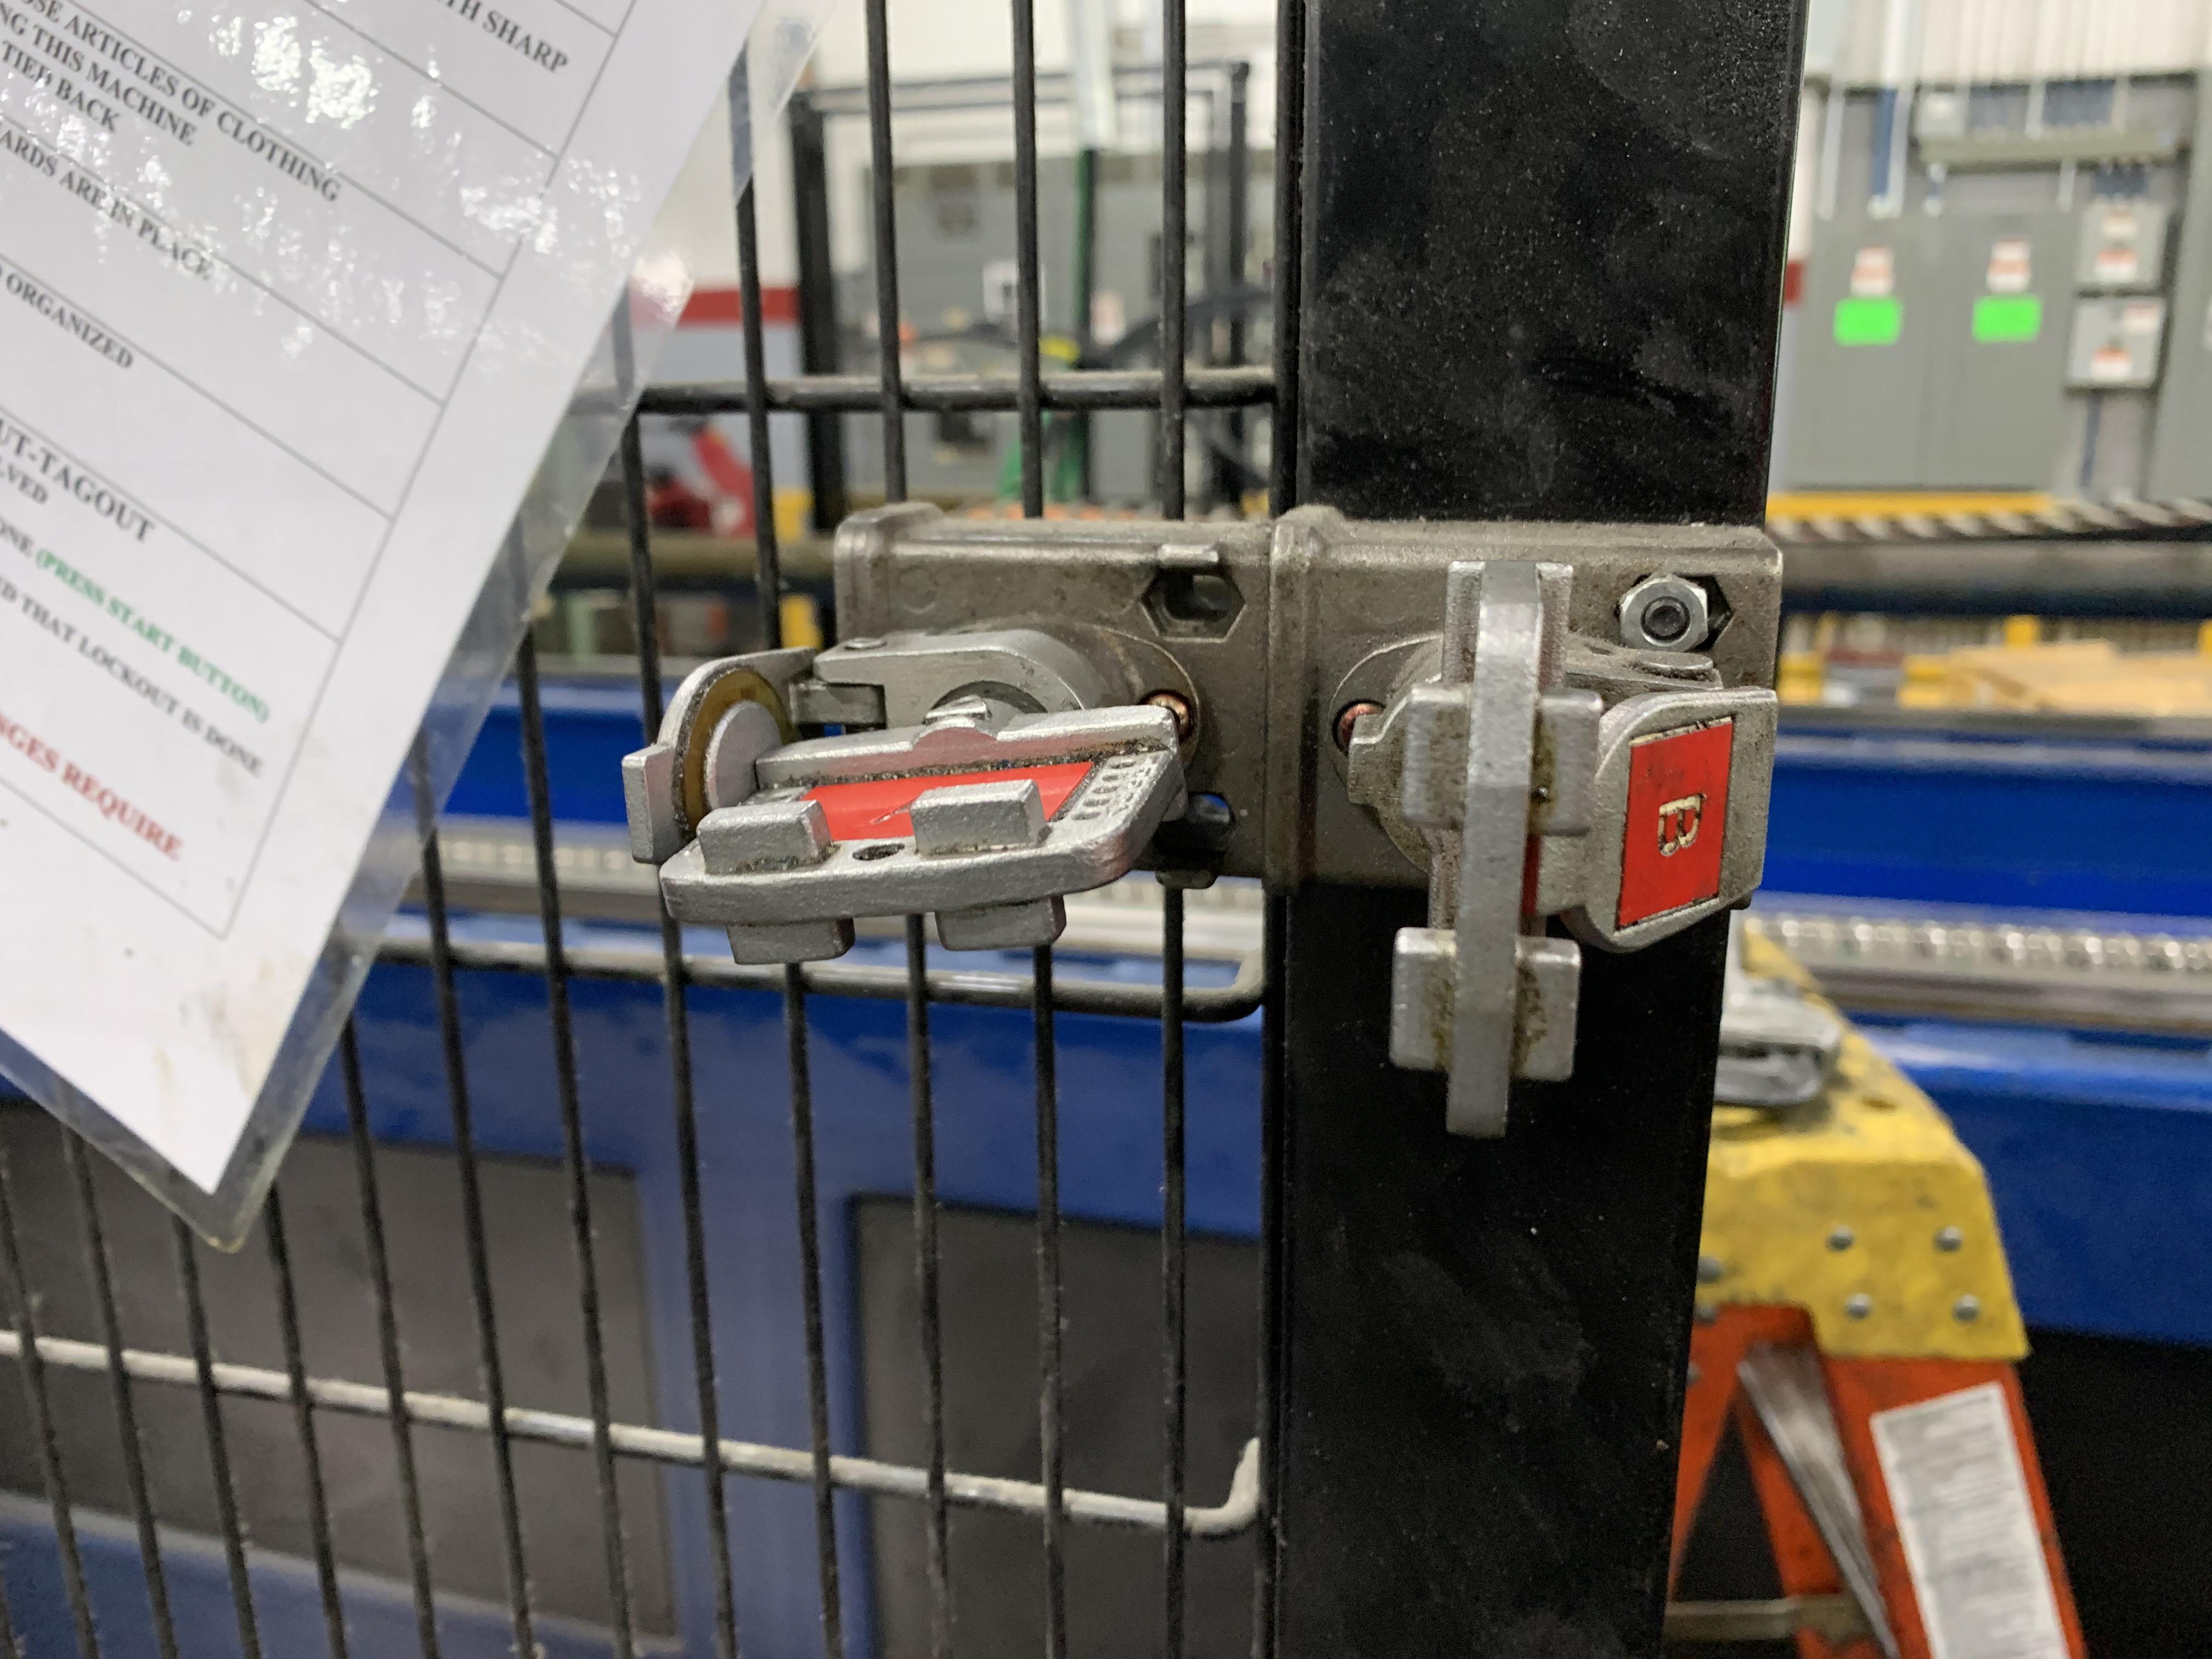 "6"" UNISON MODEL 6"" MS RH ELECTRIC CNC MULTI-STACK TUBE BENDER; S/N 2715, JOB NO. ME 4-410,(NEW 2014) - Image 57 of 72"